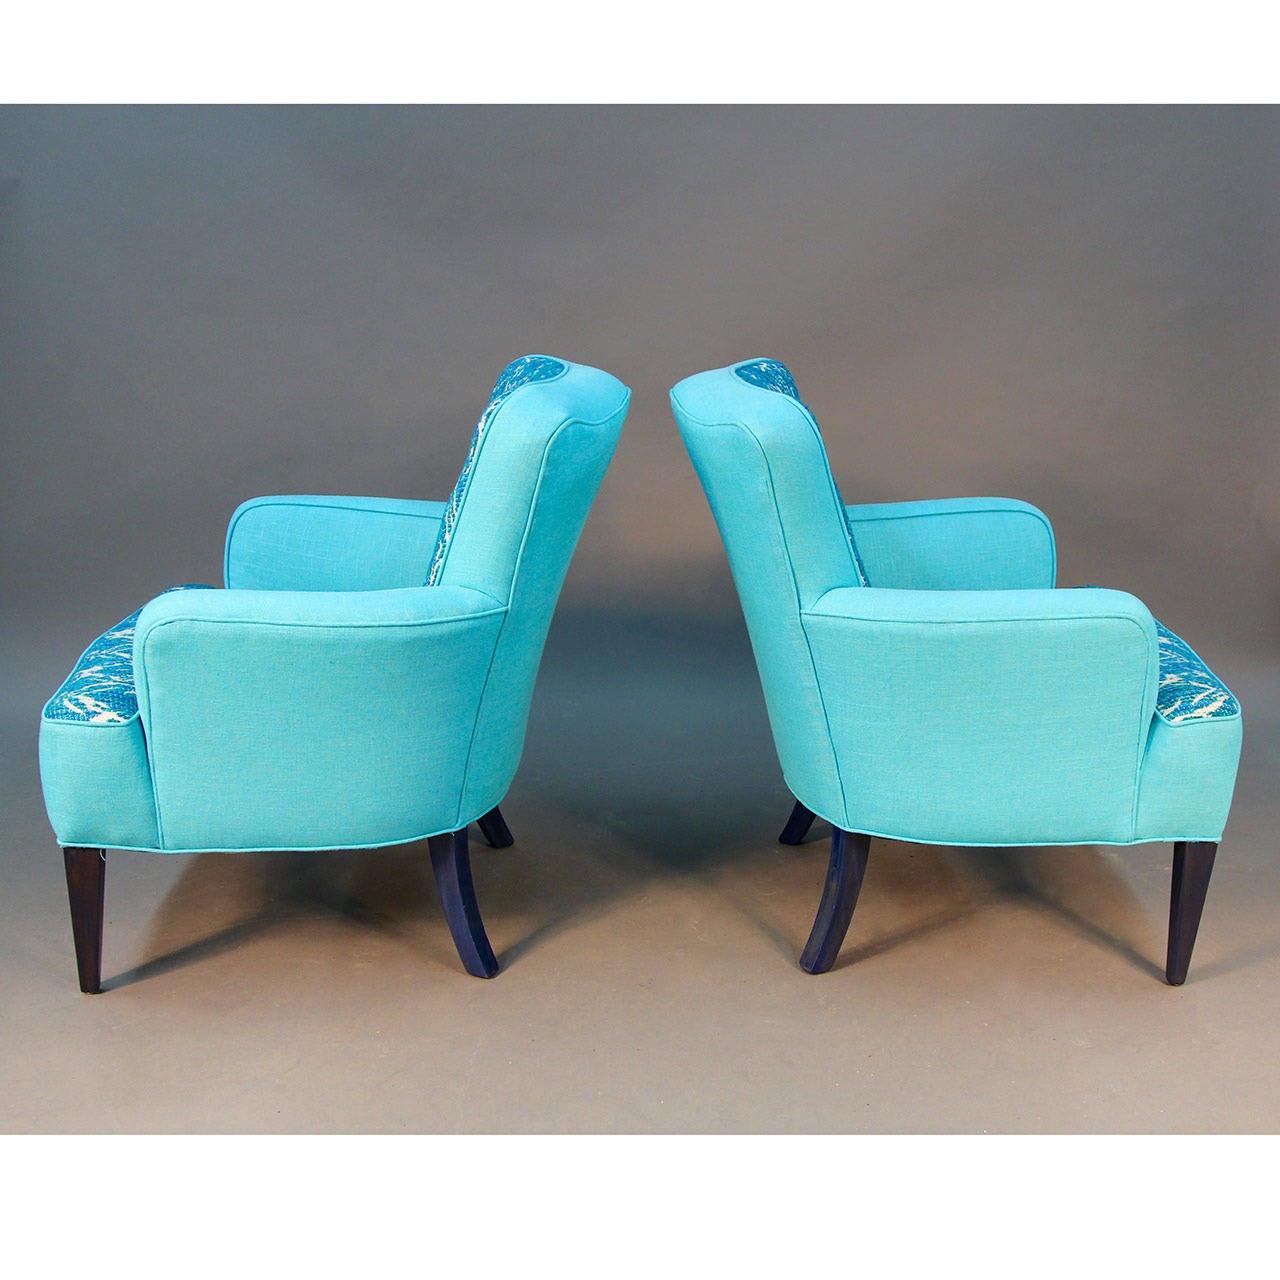 turquoise lounge chair fishing kayak pair of sala chairs draper era for sale at 1stdibs